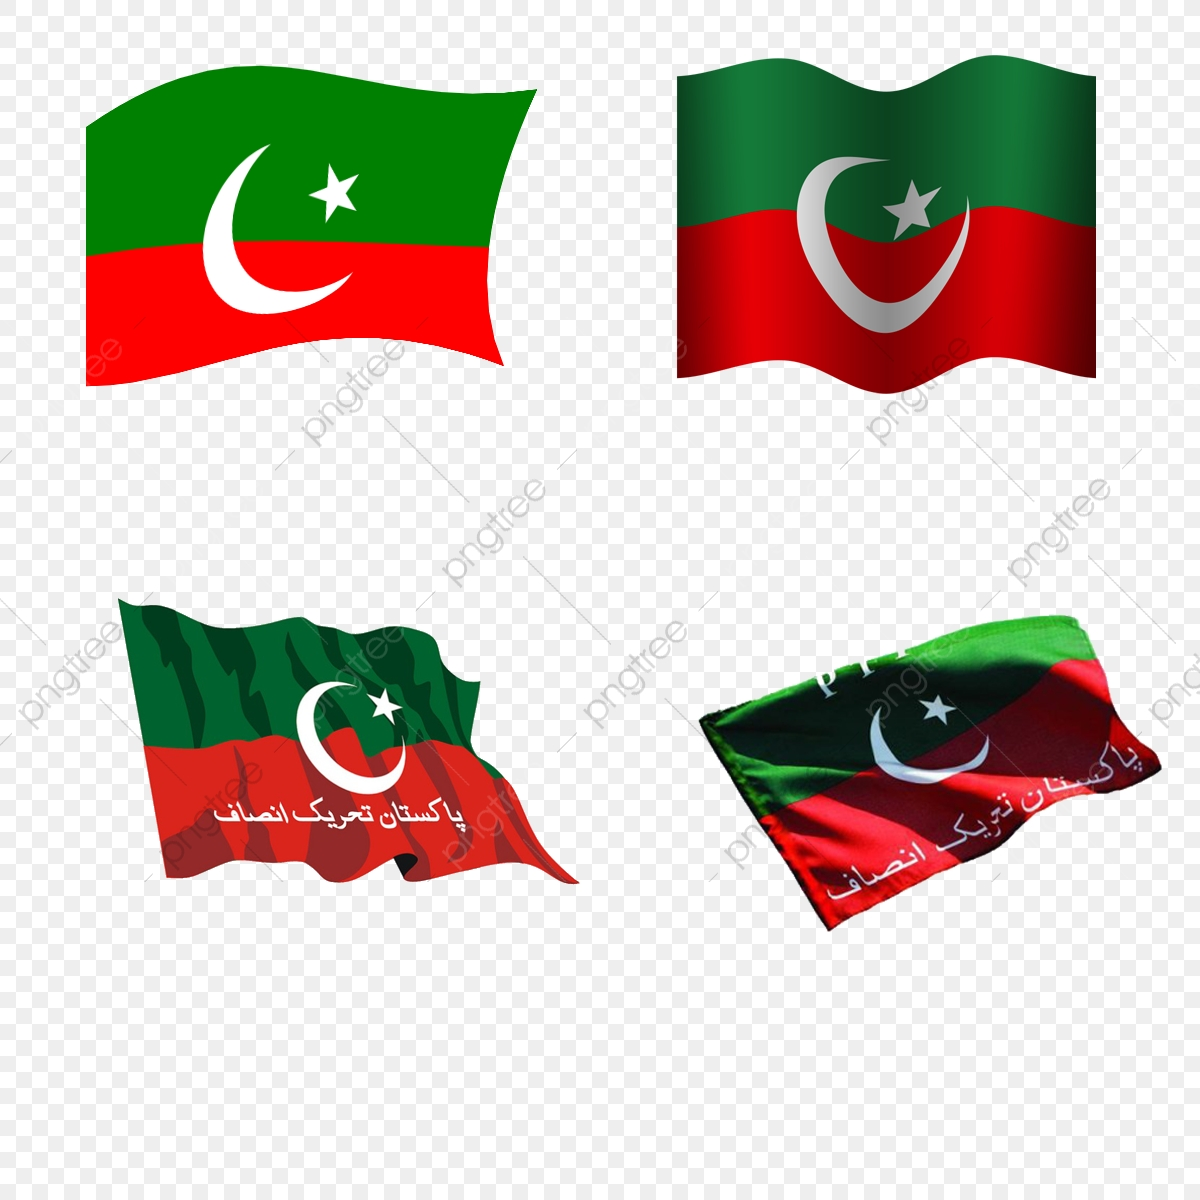 Pti Flag Png, Pti Flag Pic, Pti Logo Png, Pti Flag Colours.